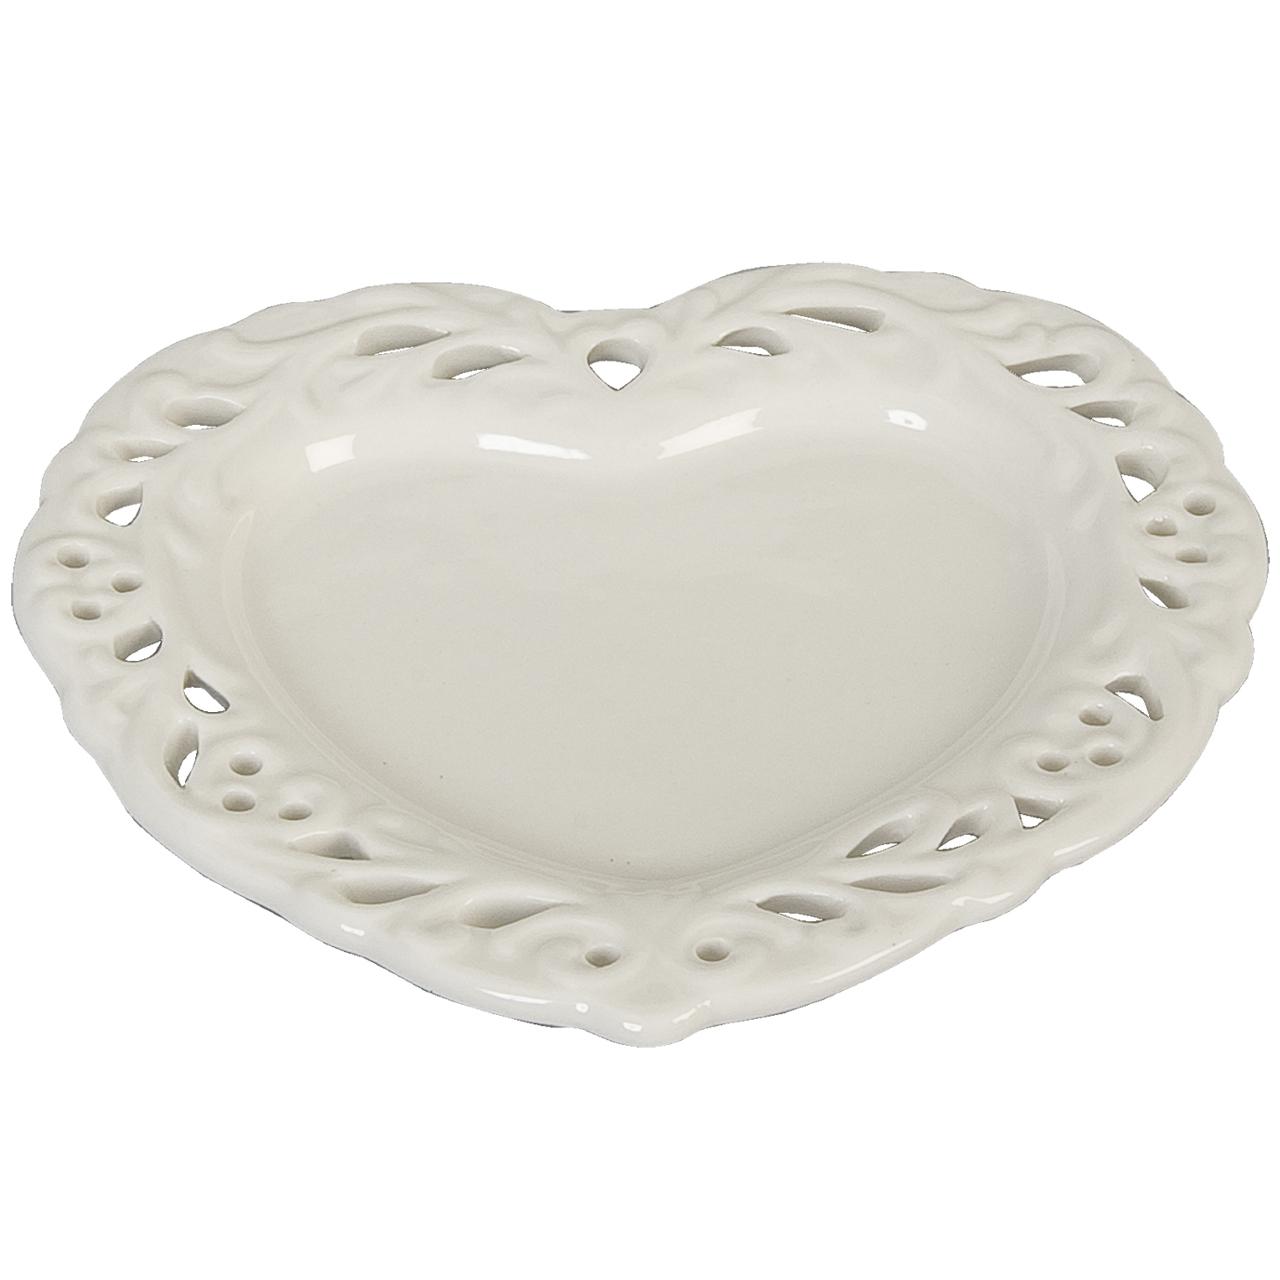 Platou In Forma De Inima Din Ceramica Alba 15 Cm